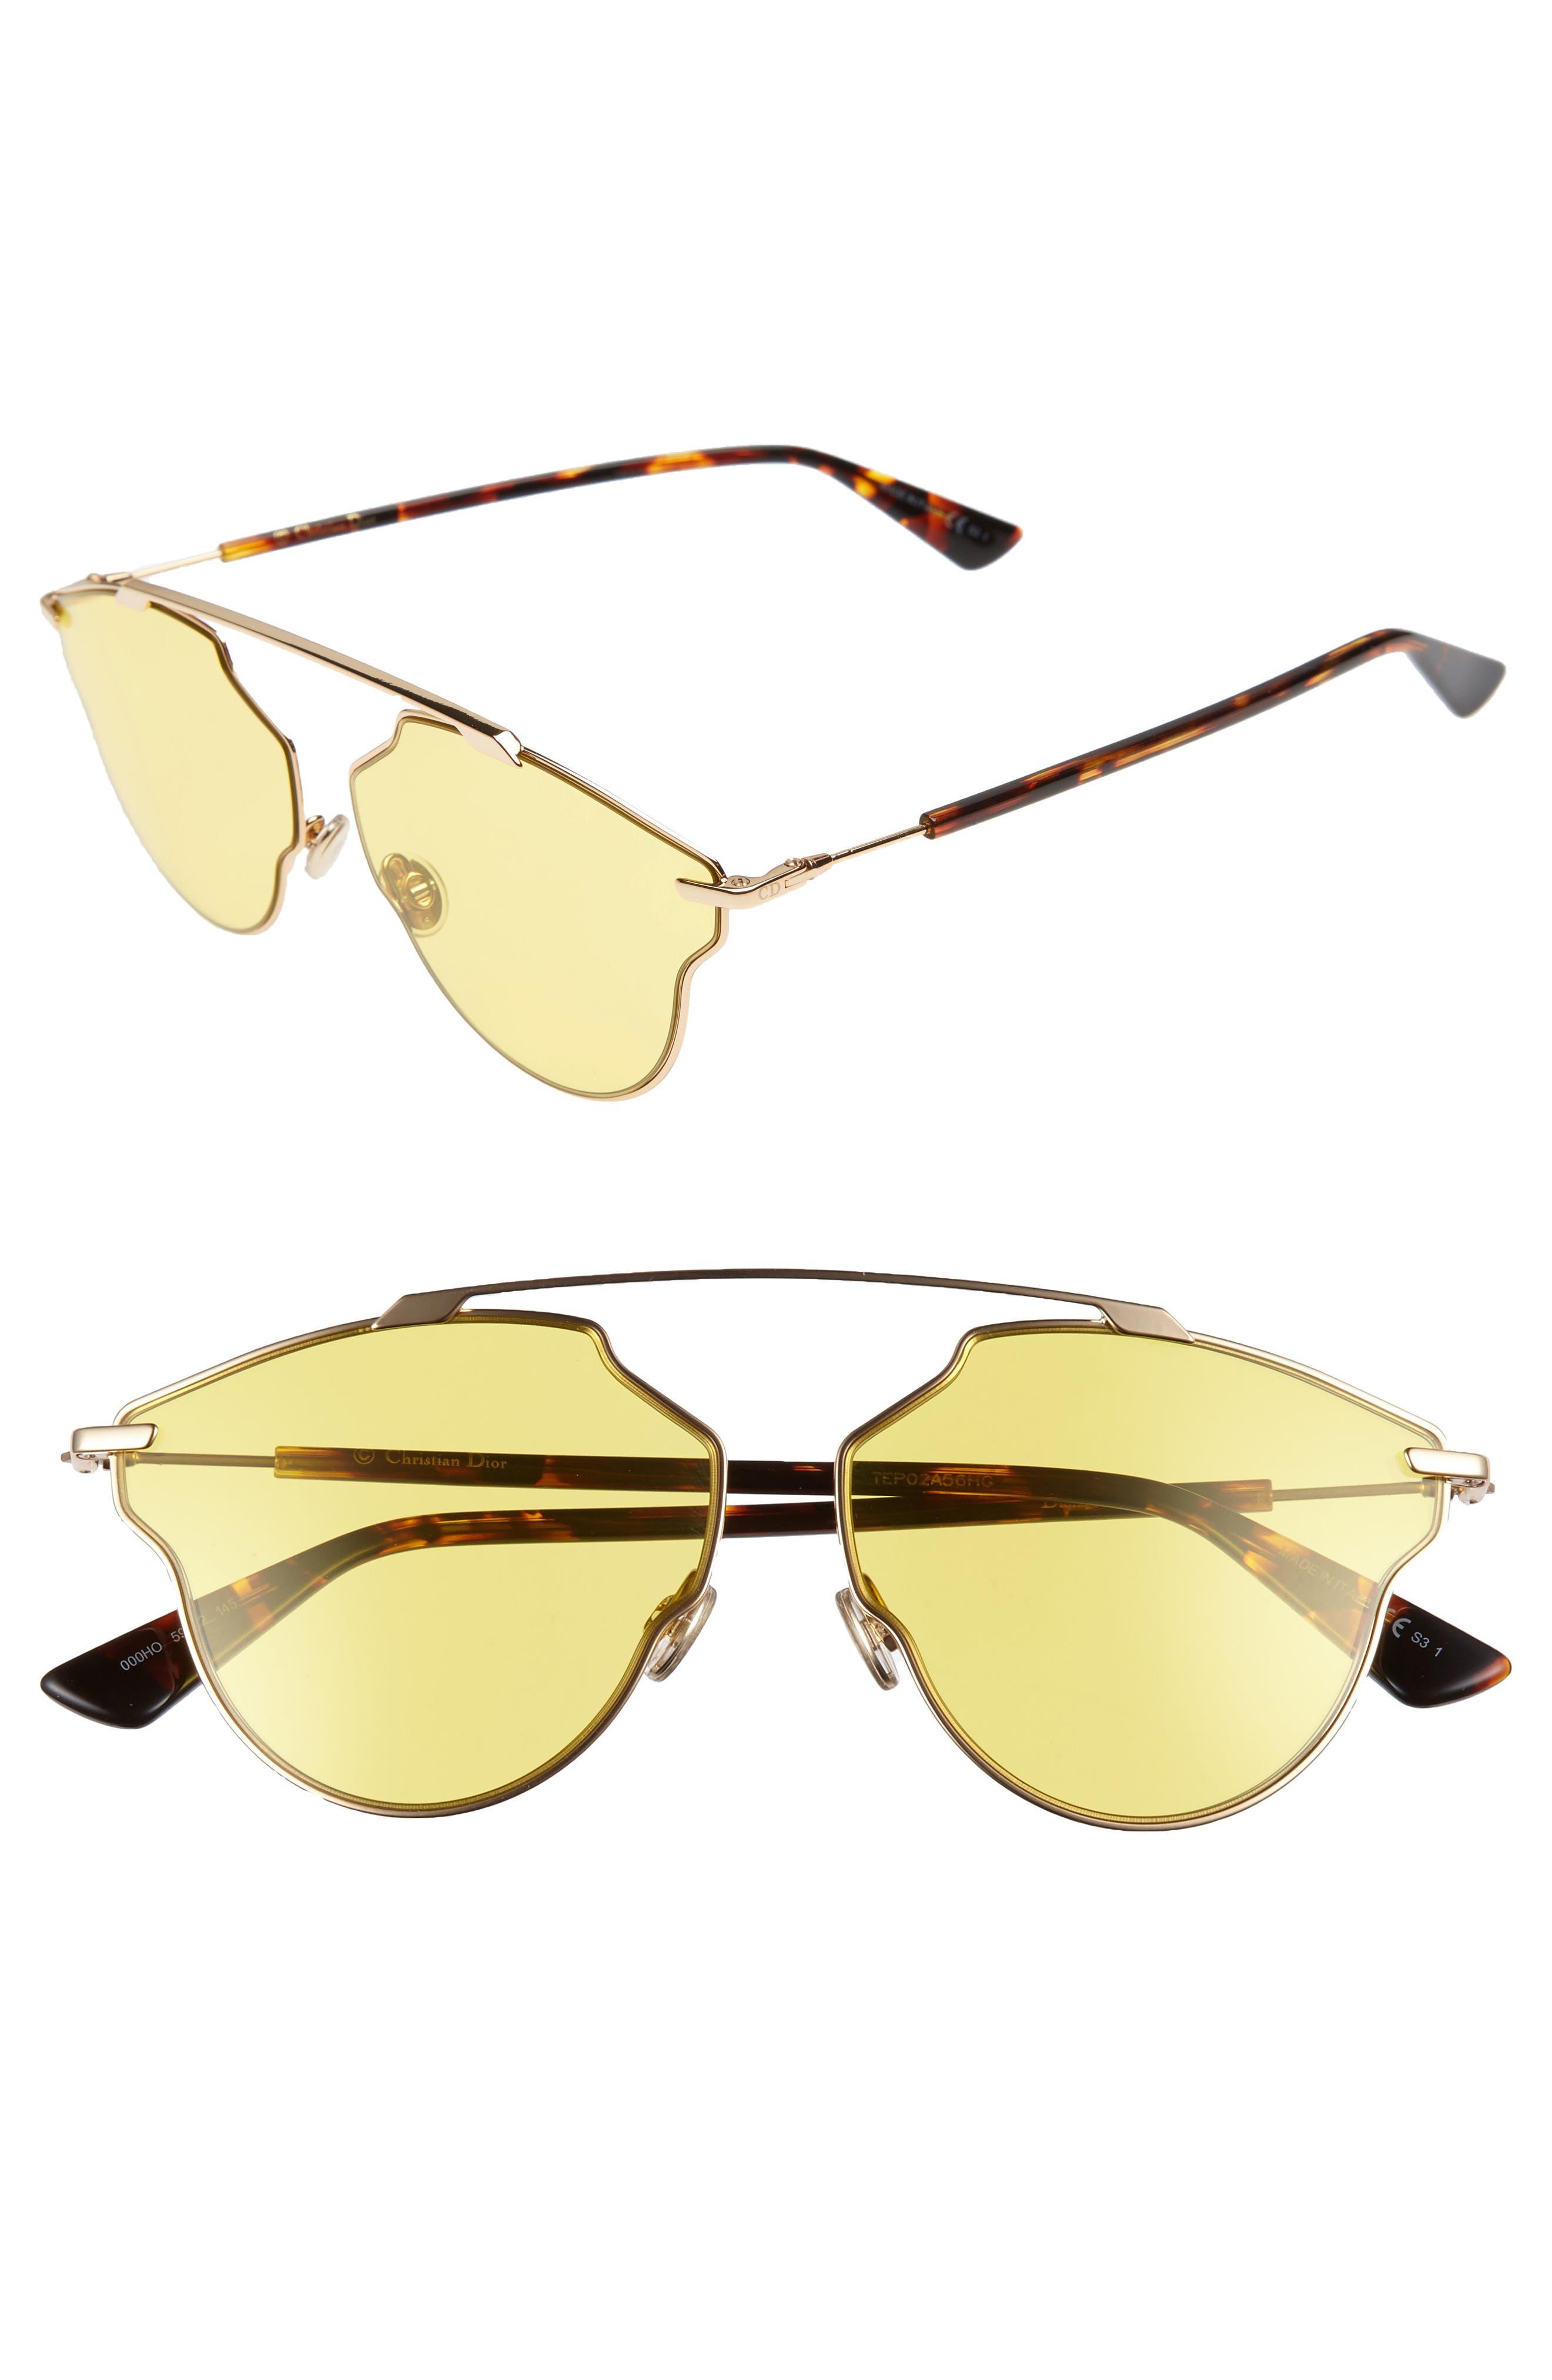 Dior 448 Dior 59mm Sunglasses